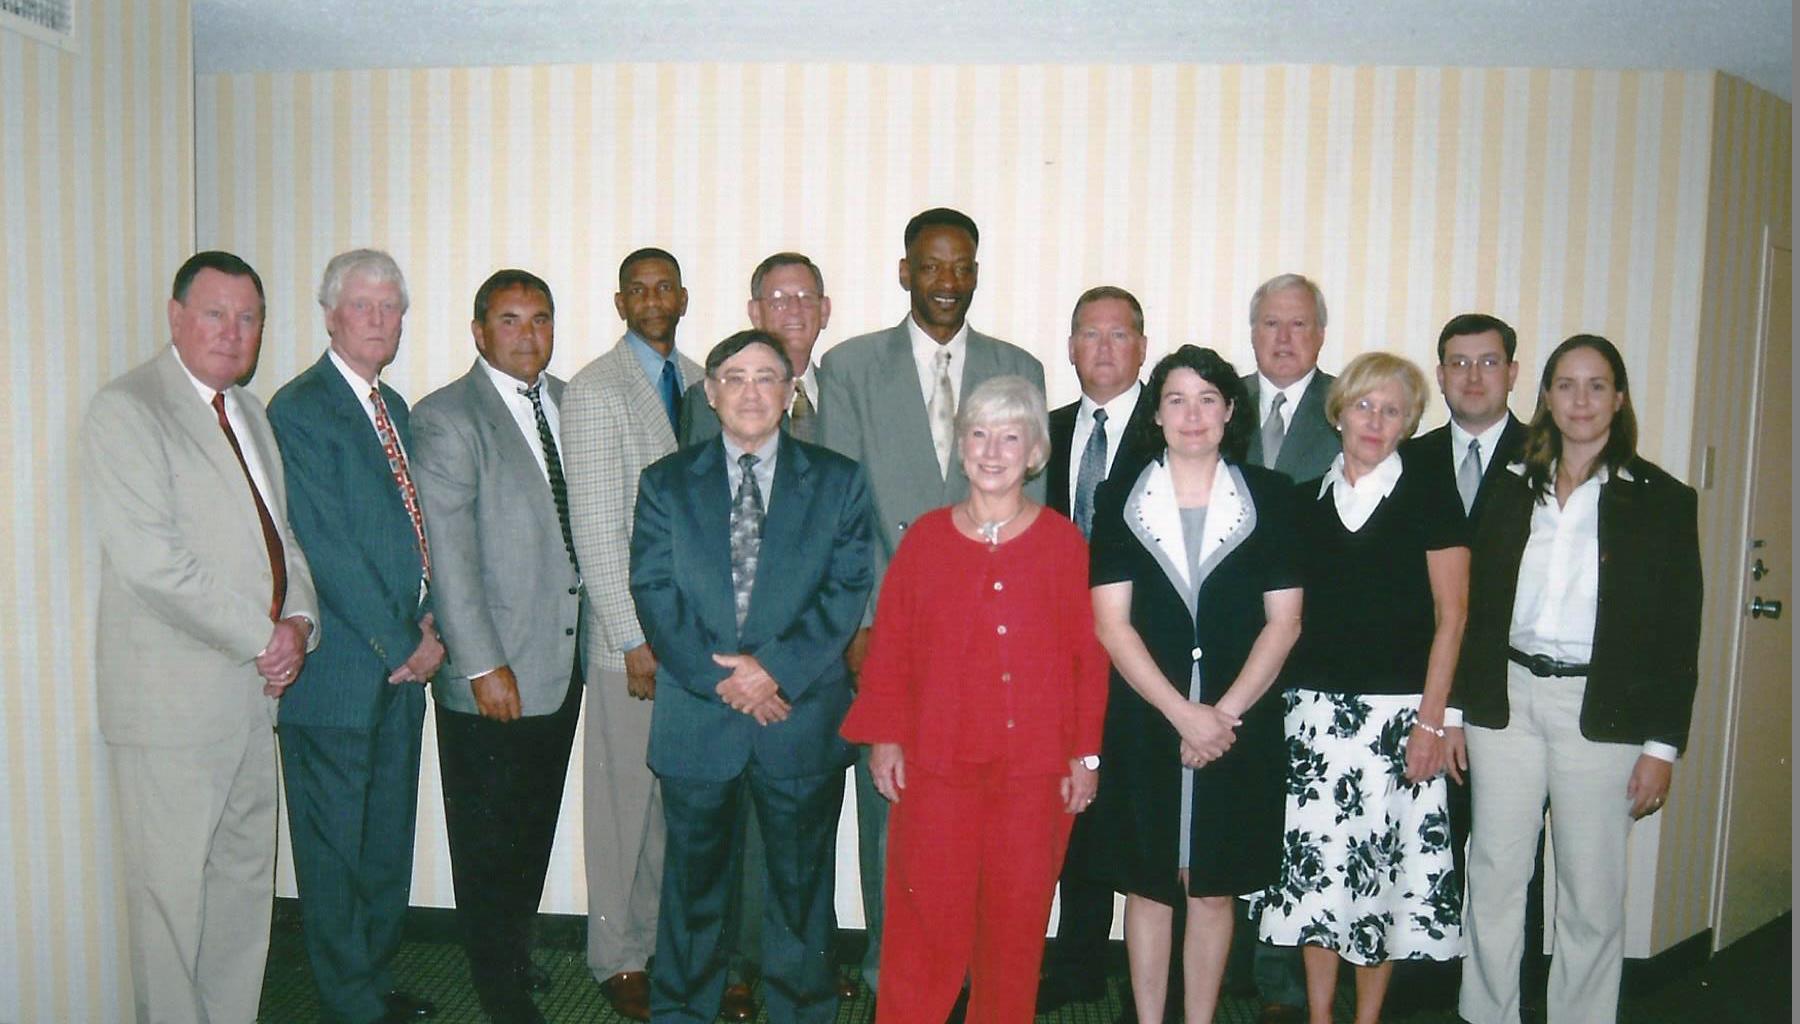 2004 class